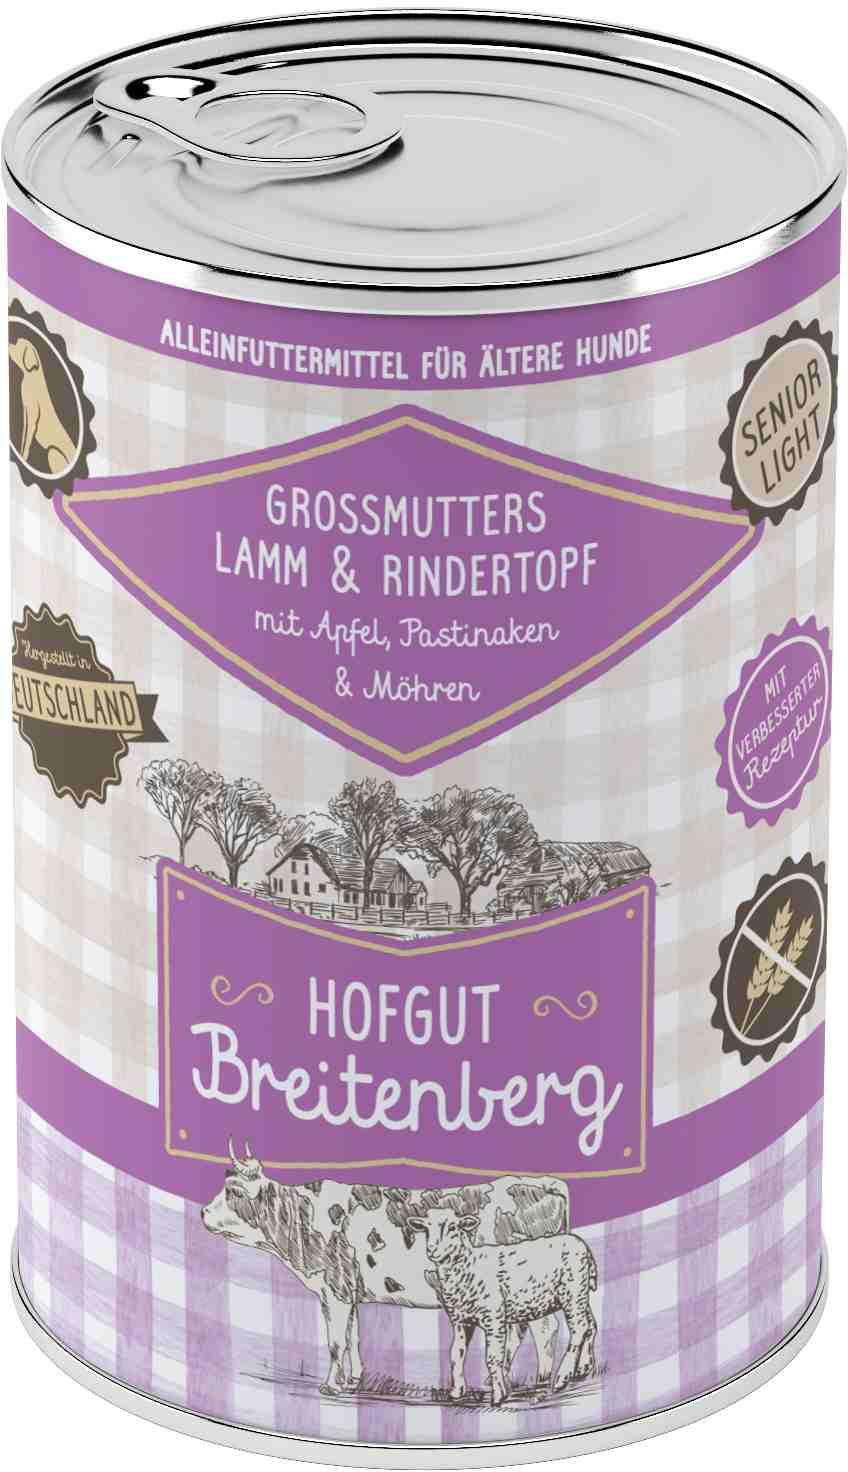 Hofgut Breitenberg Dog Grossmutters Lammtopf 400g